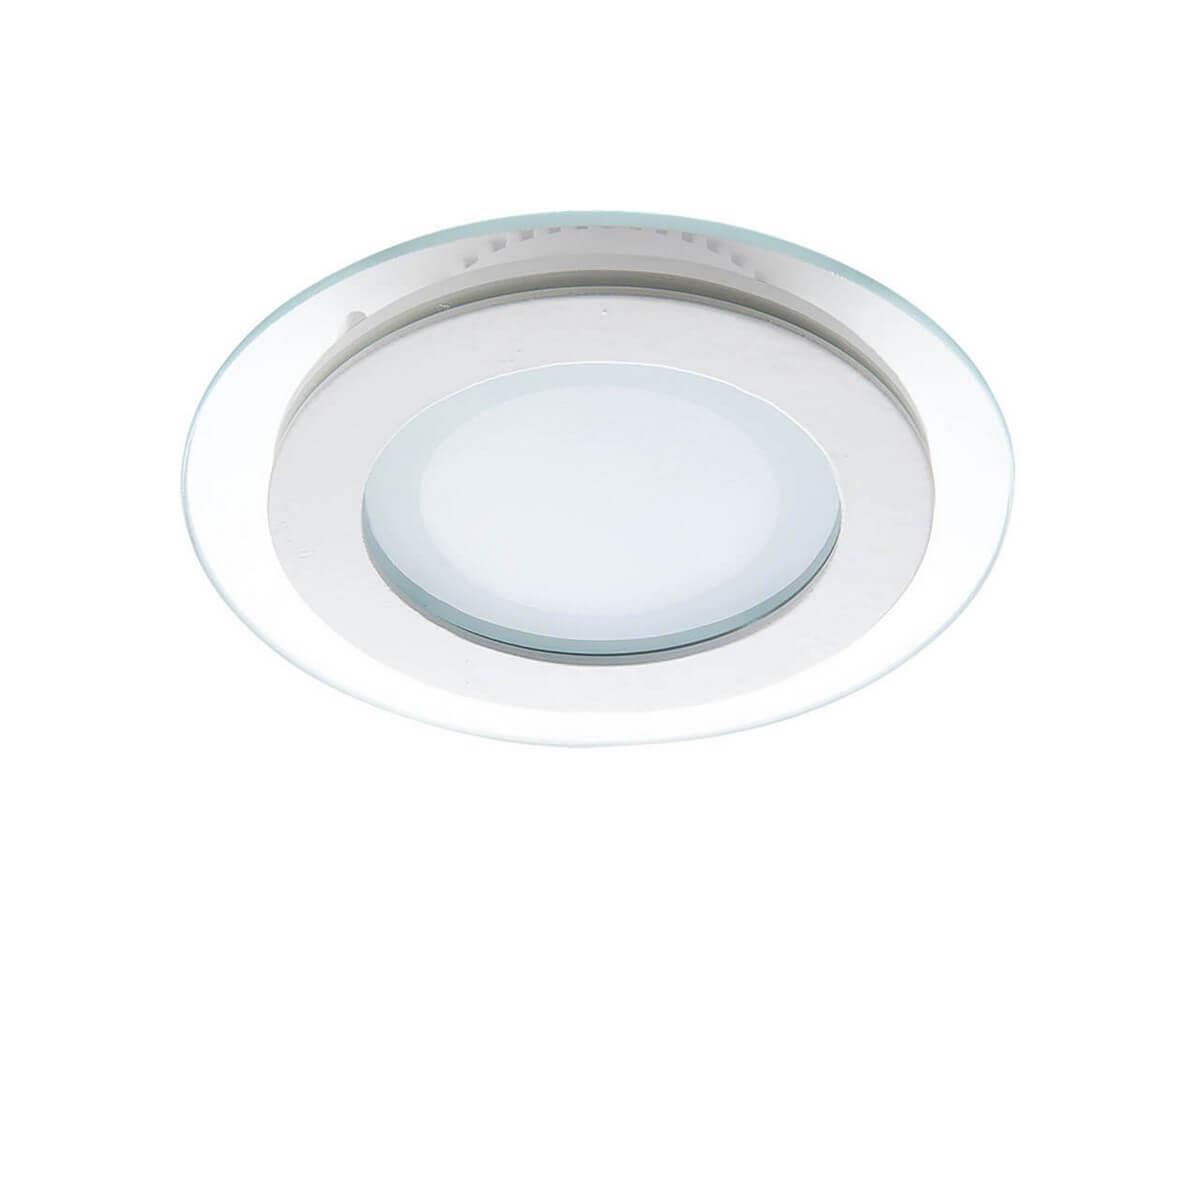 Светильник Lightstar 212010 Acri LED